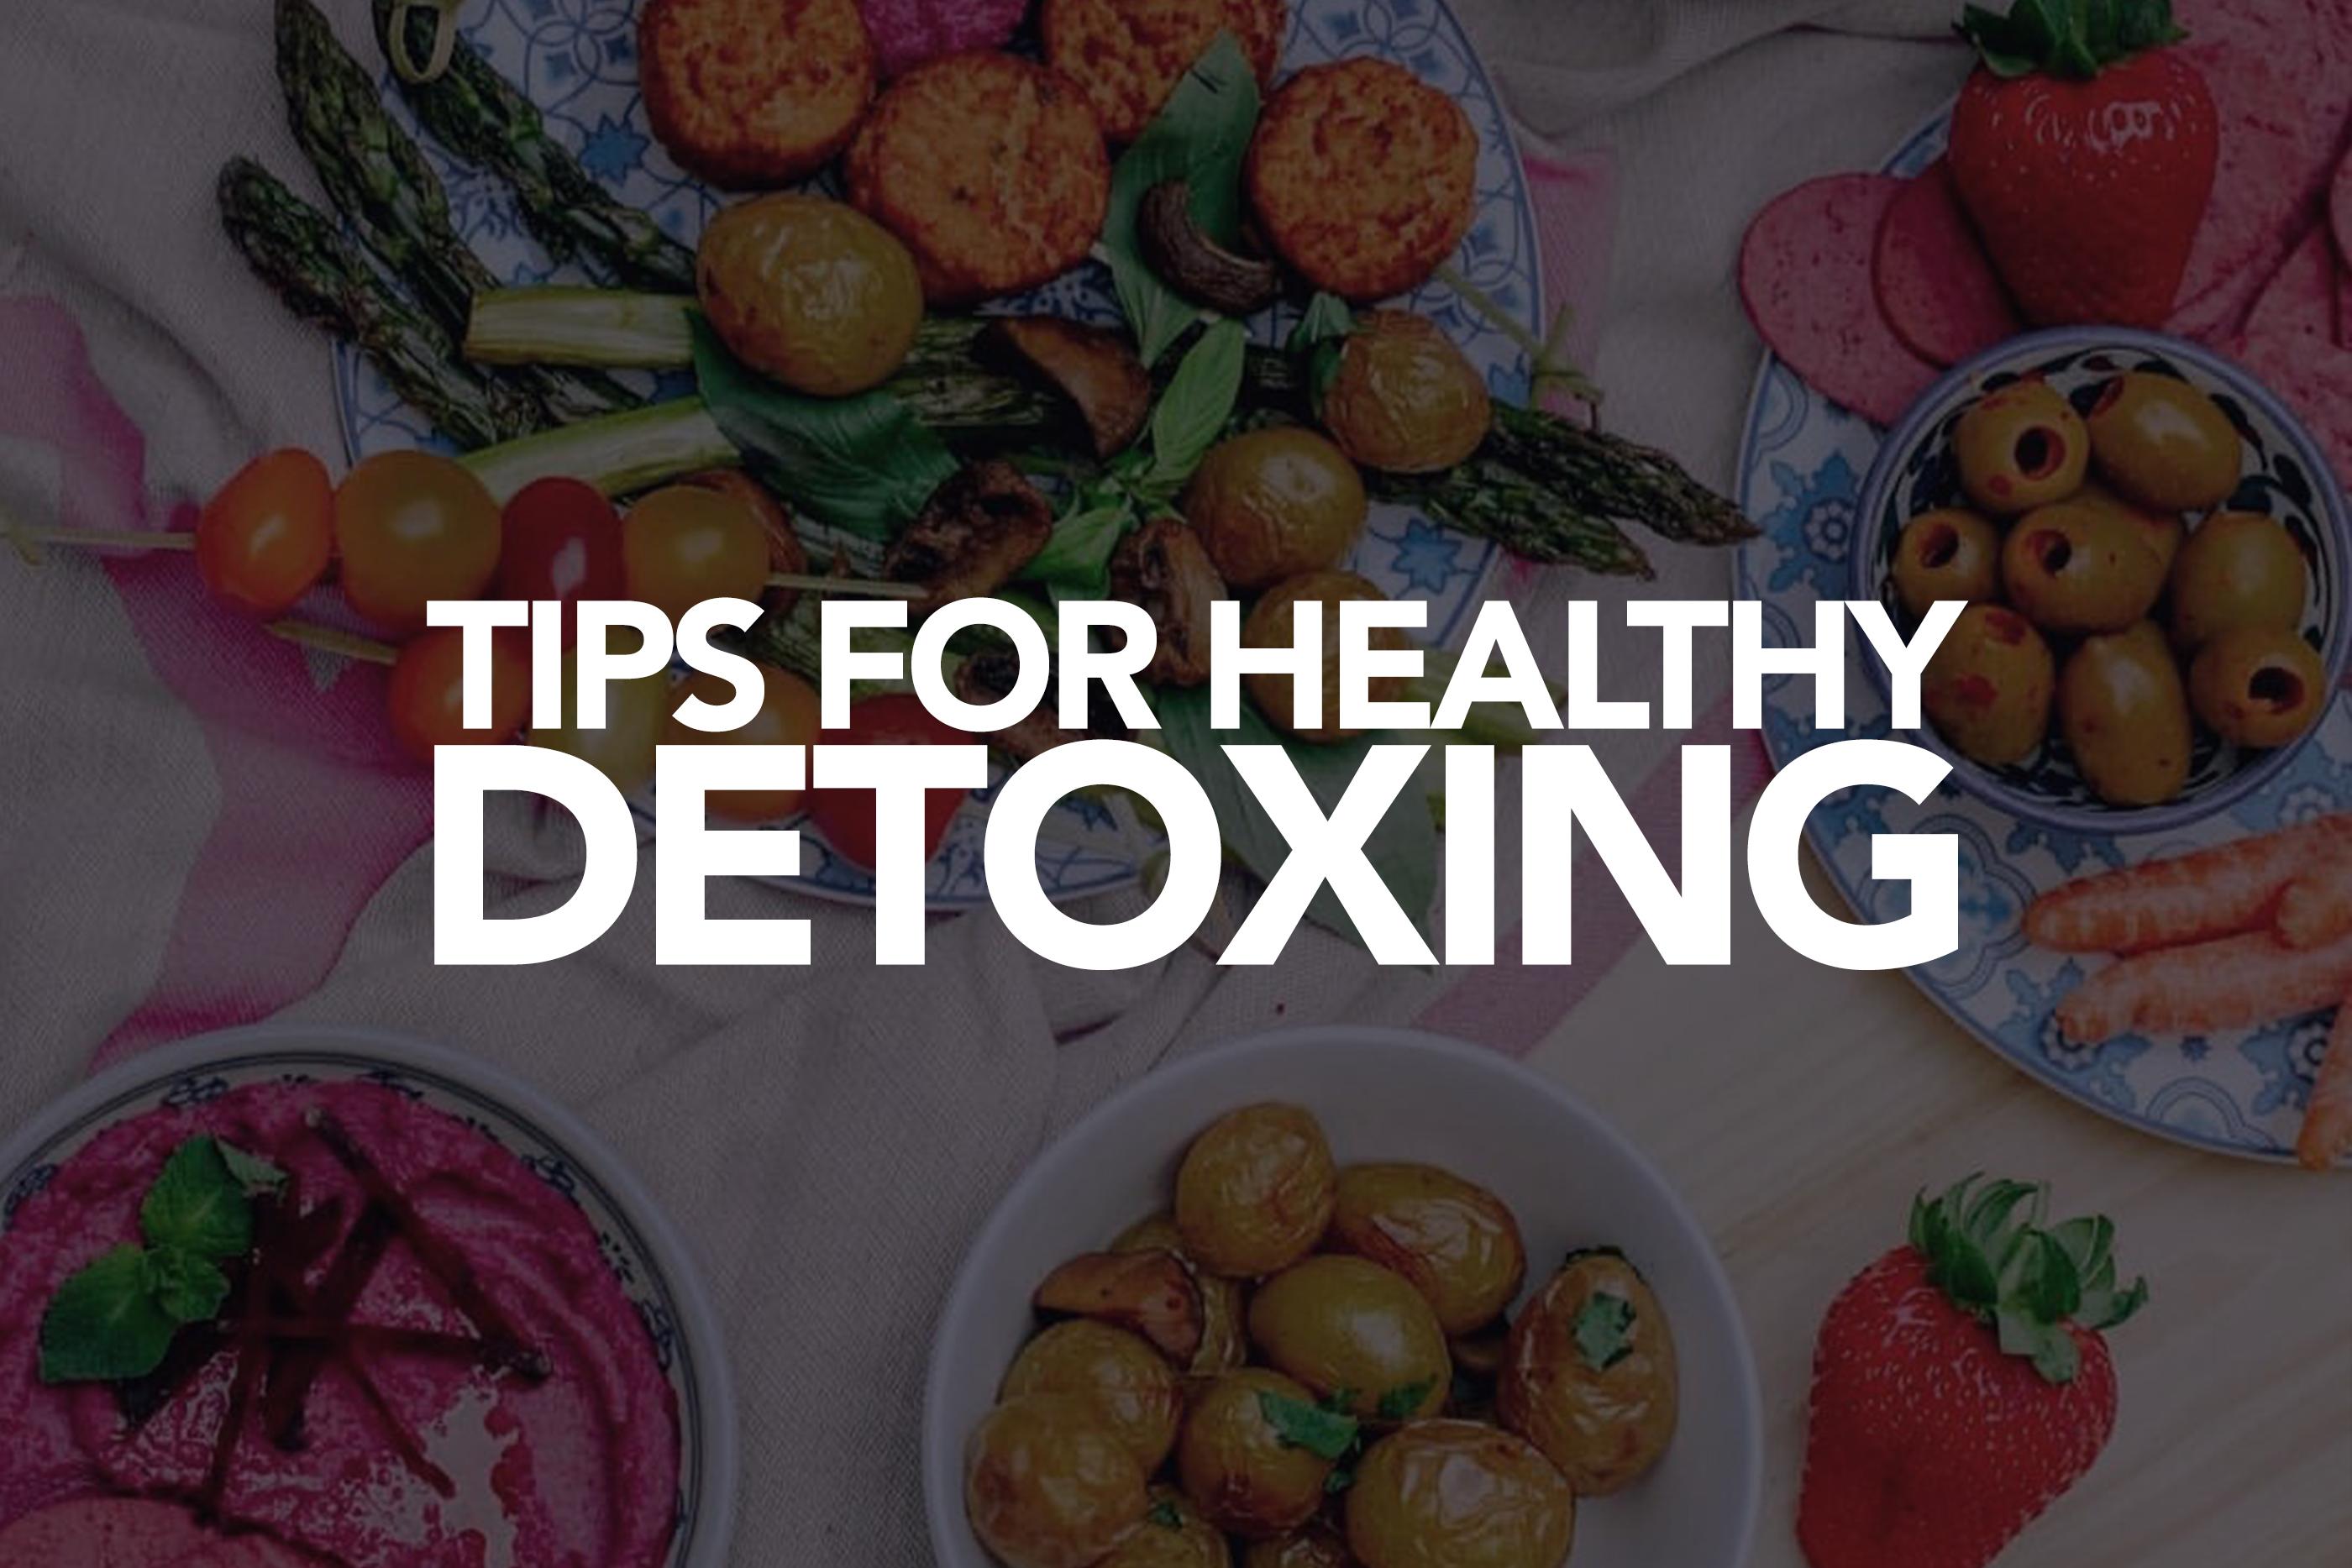 TIPS FOR HEALTHY DETOXING